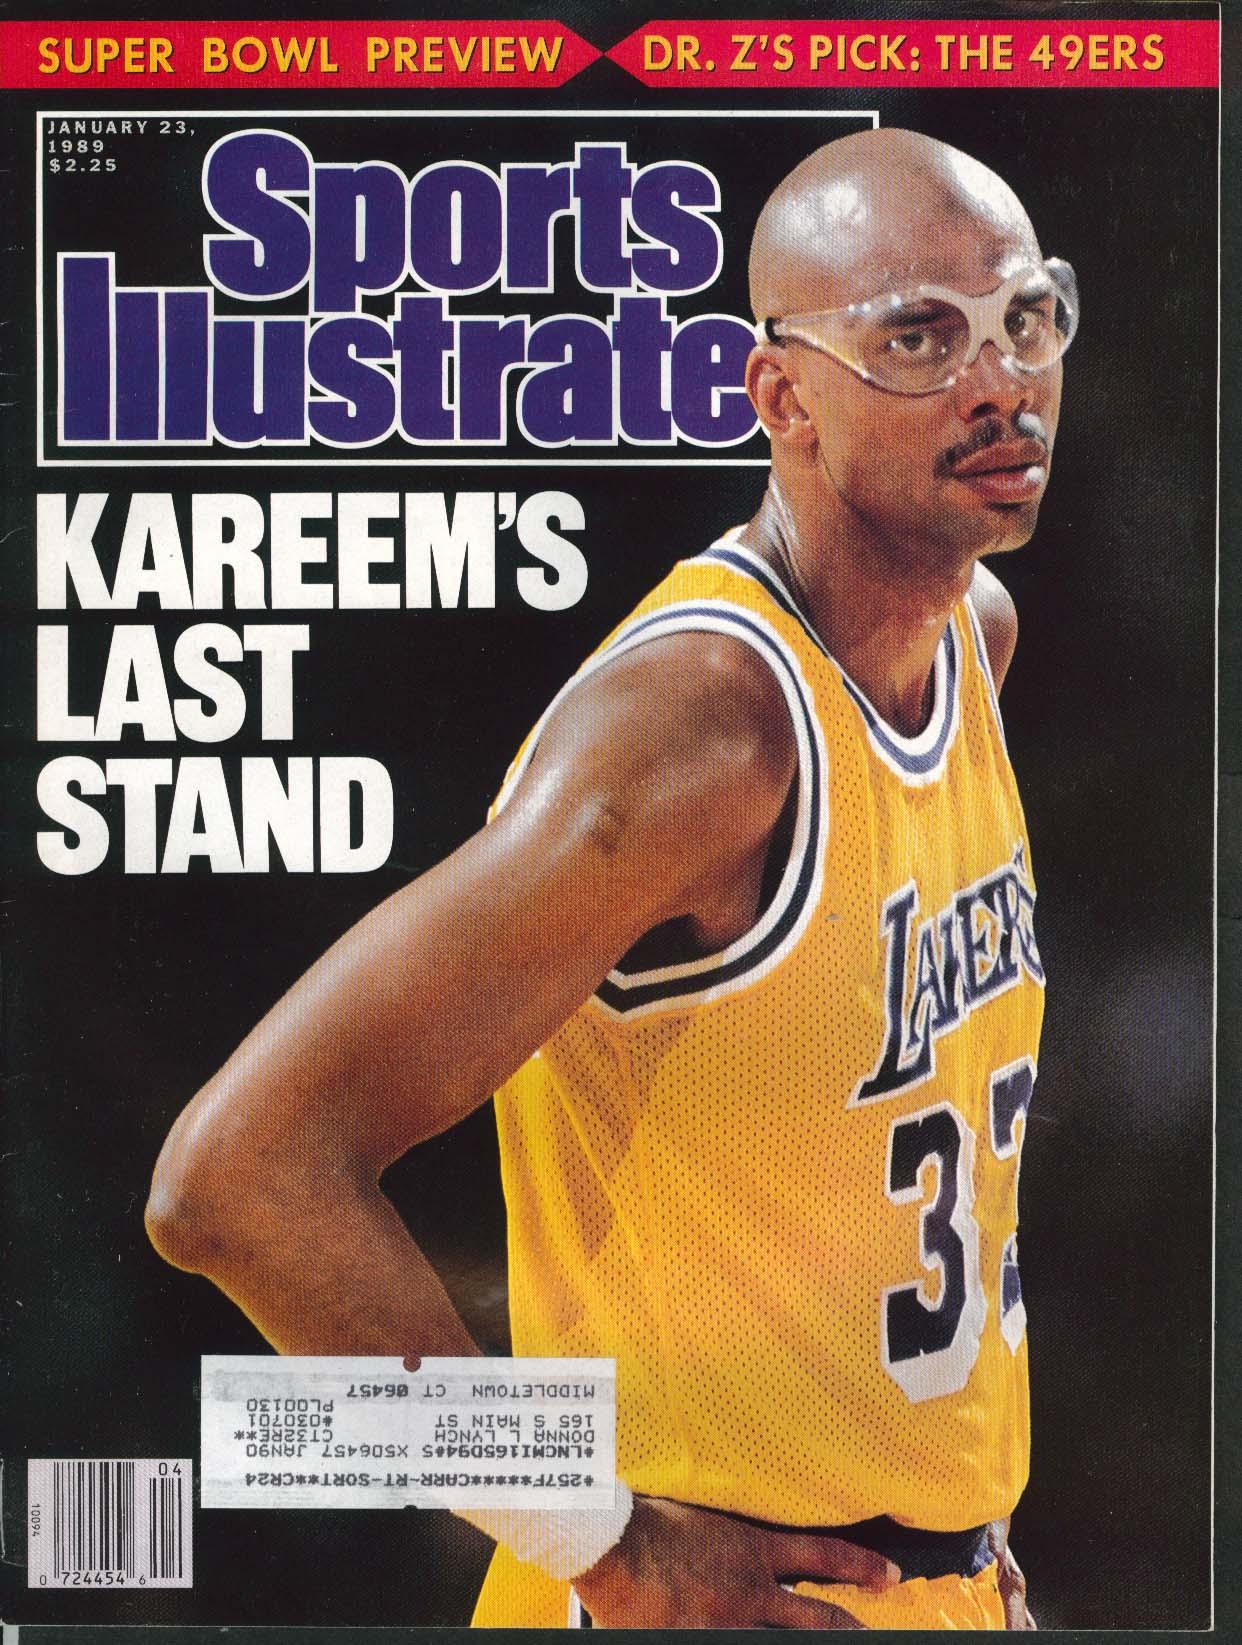 SPORTS ILLUSTRATED Kareem Abdul Jabbar Steve Jones Bob Hope 1/23 1989